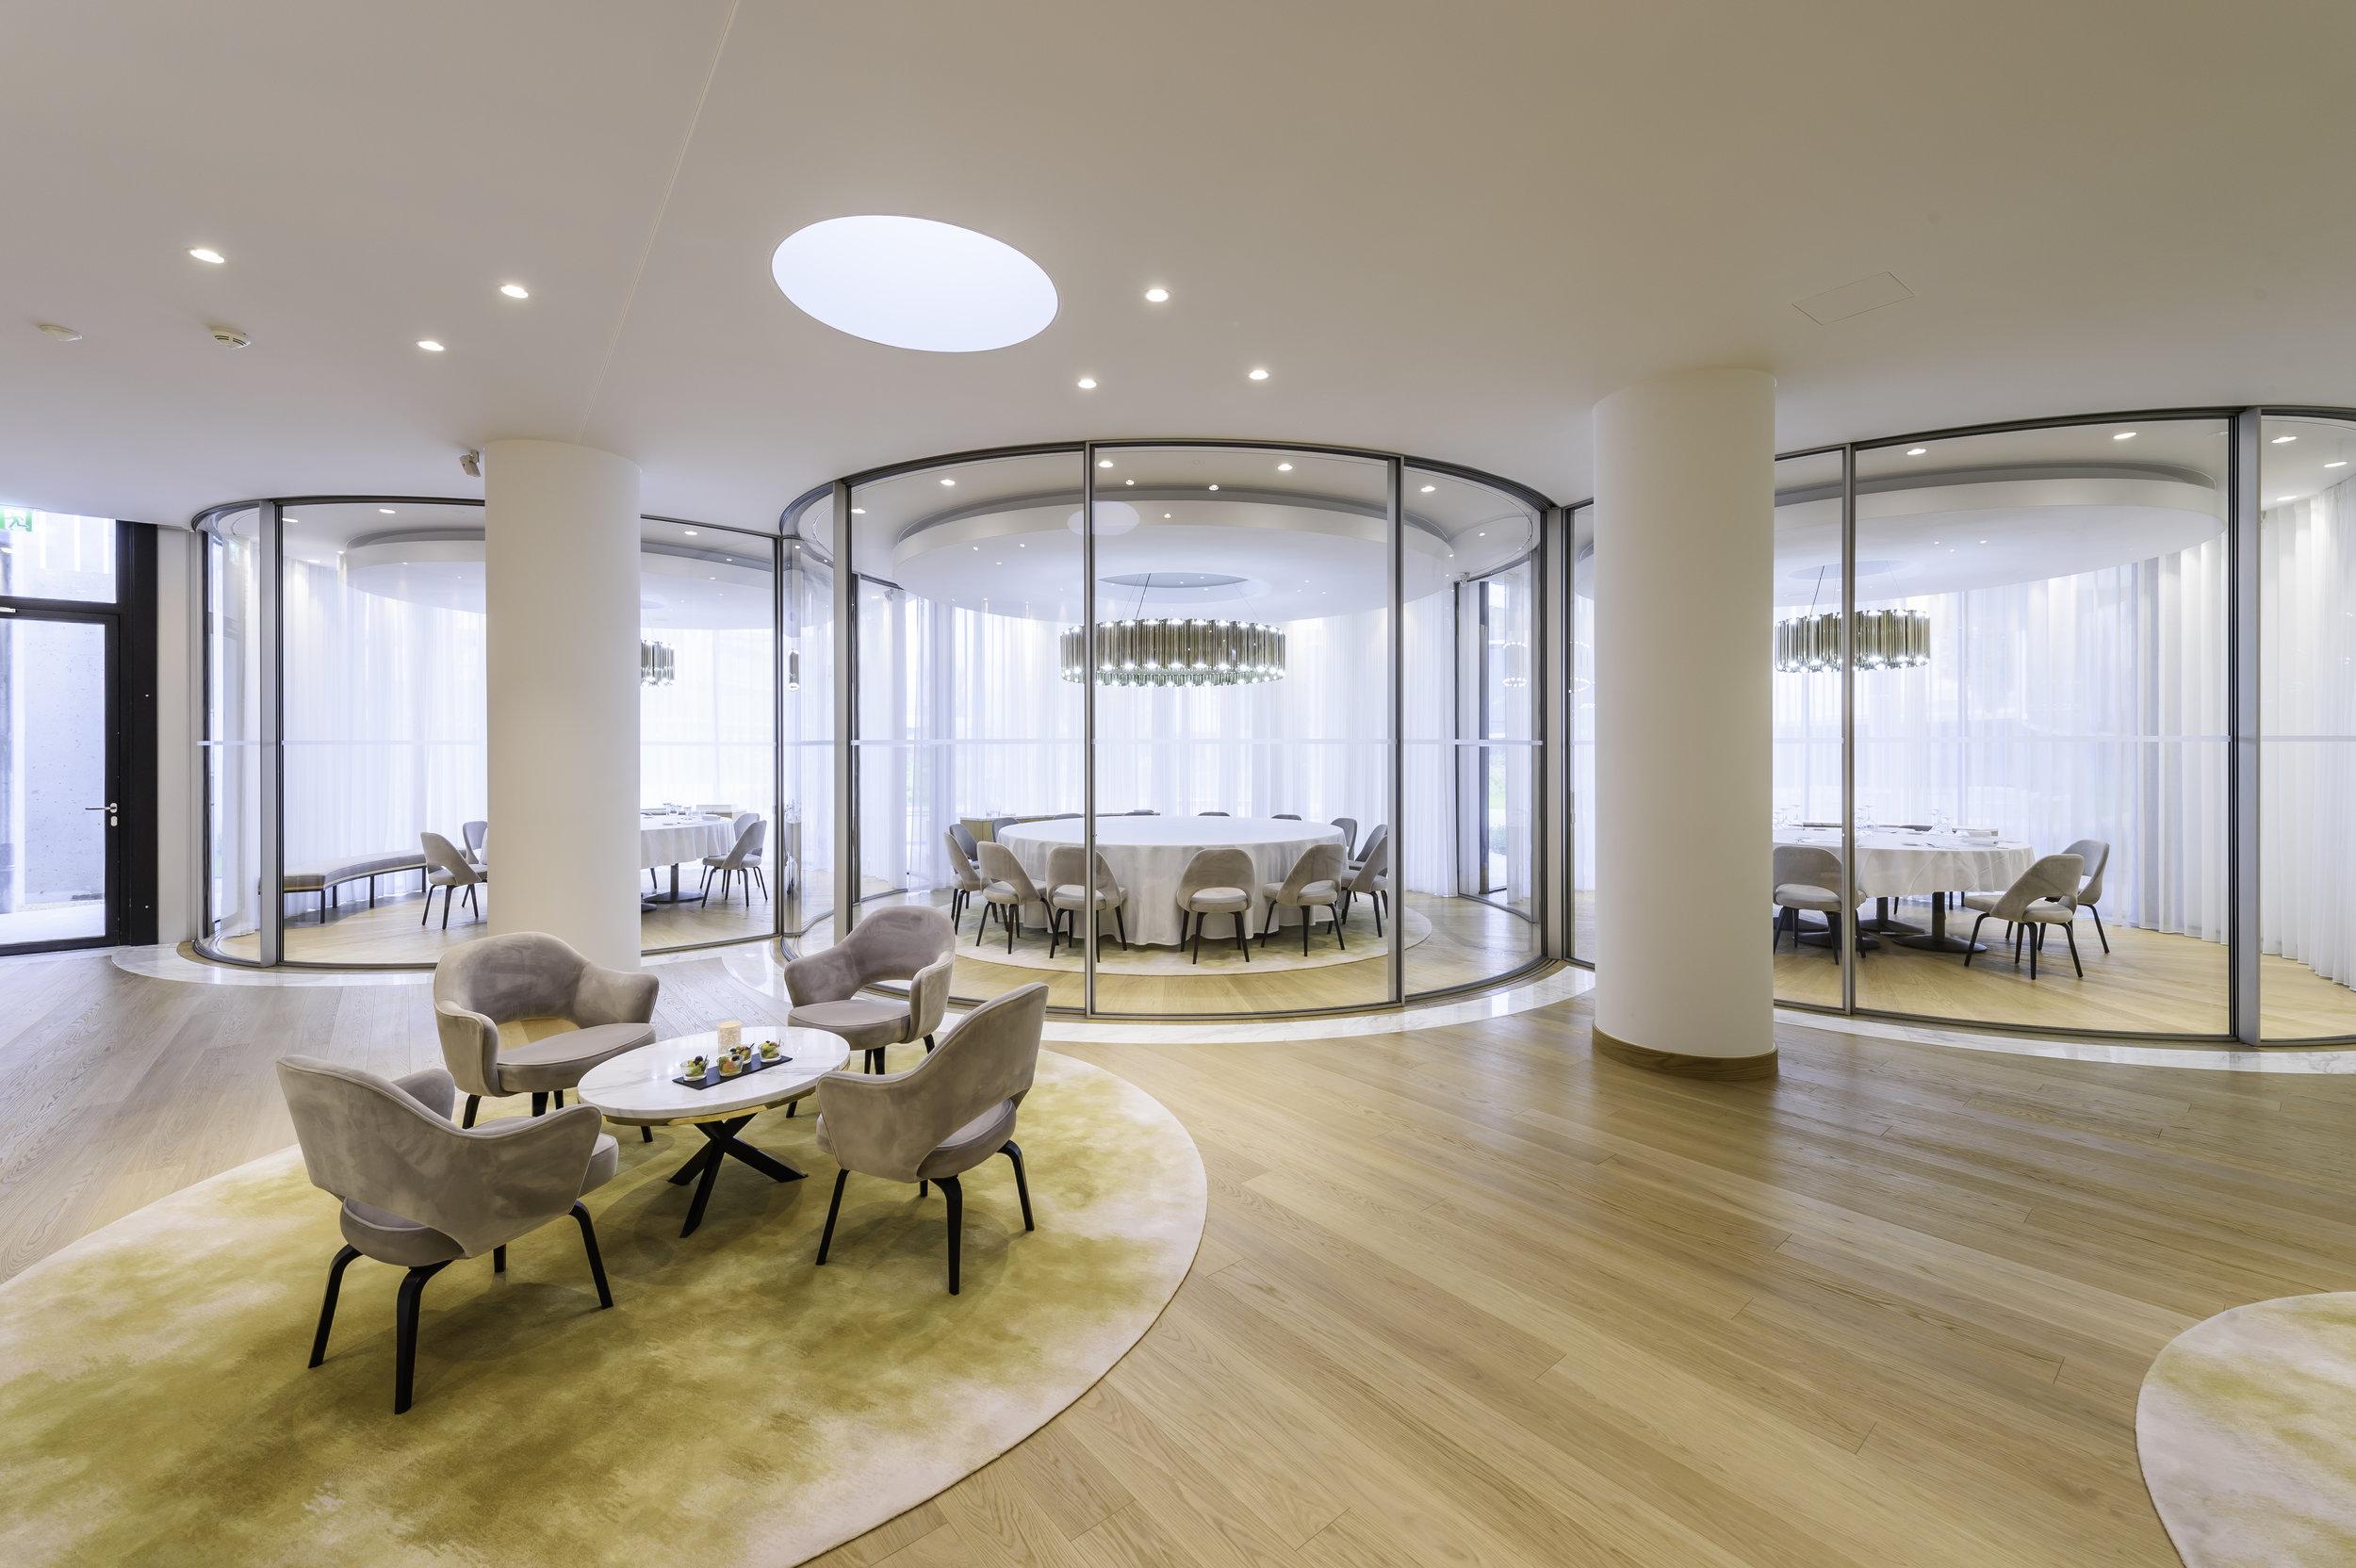 Piaget VIP rooms